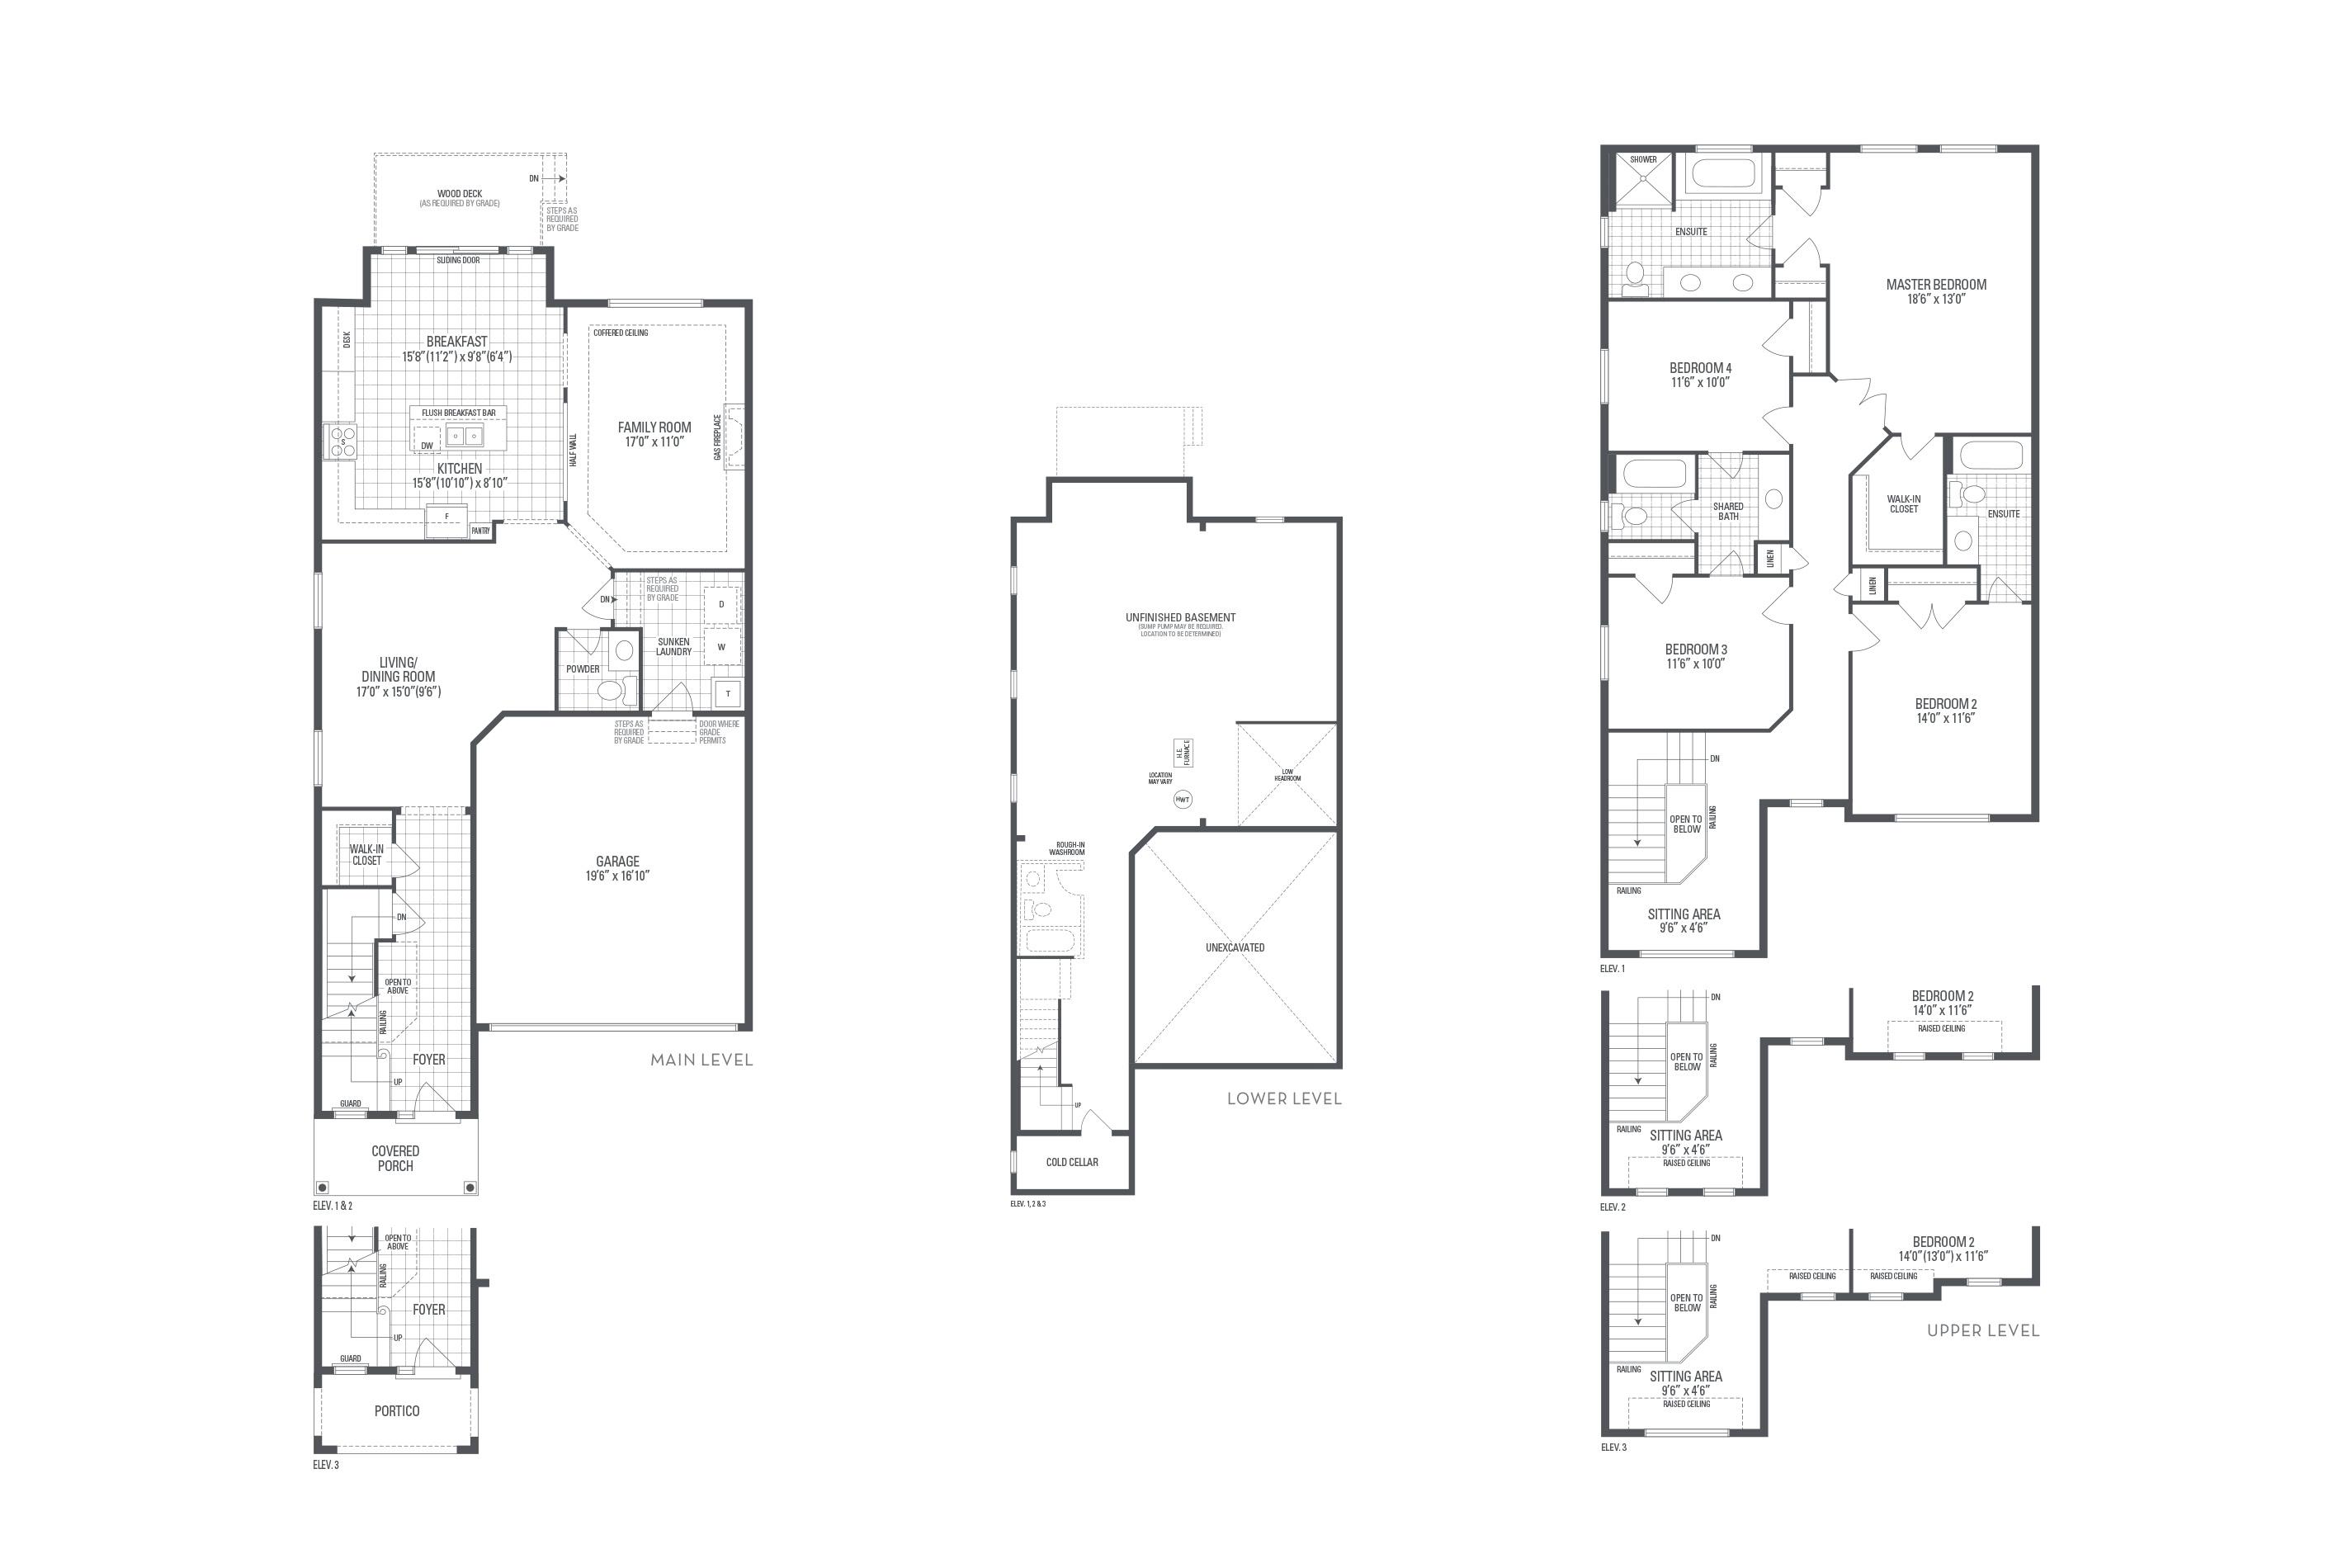 Bronte 06A Elev. 3 Floorplan